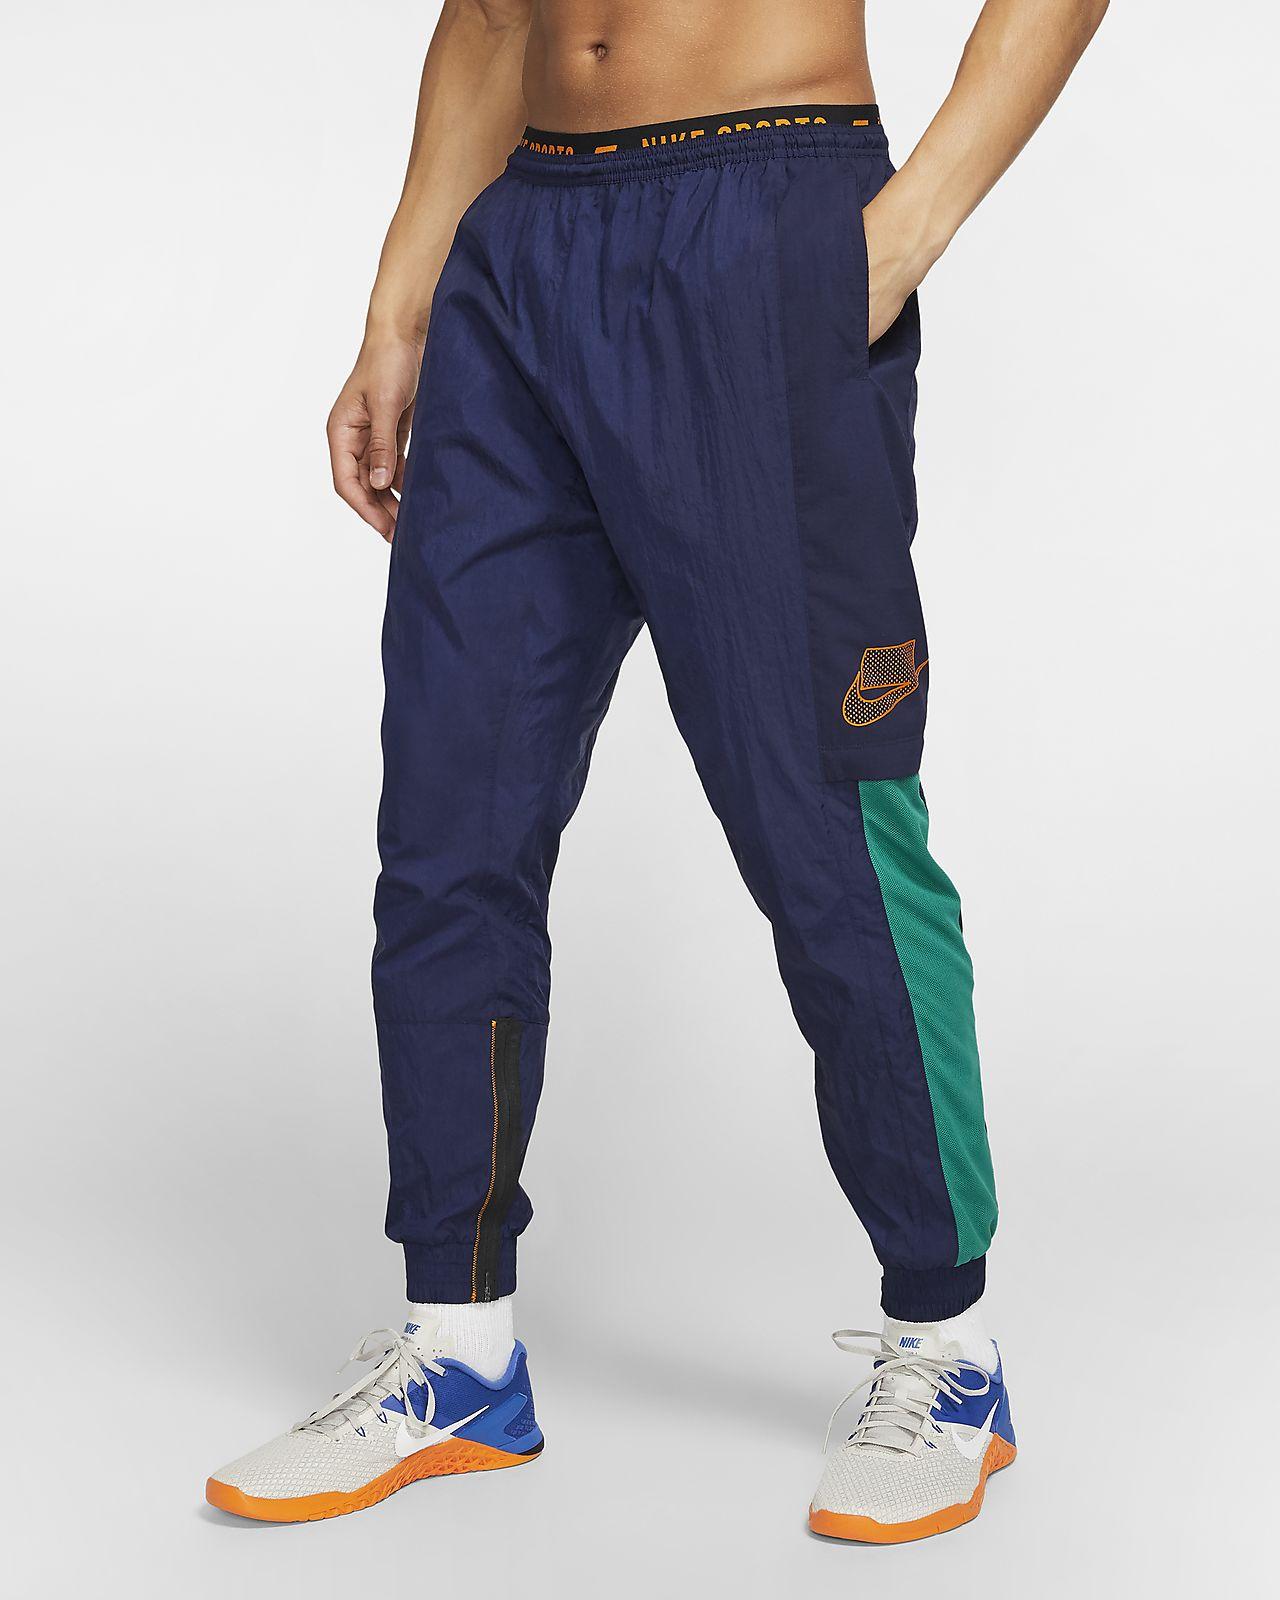 Nike Dri-FIT Flex Sport Clash Herren-Trainingshose